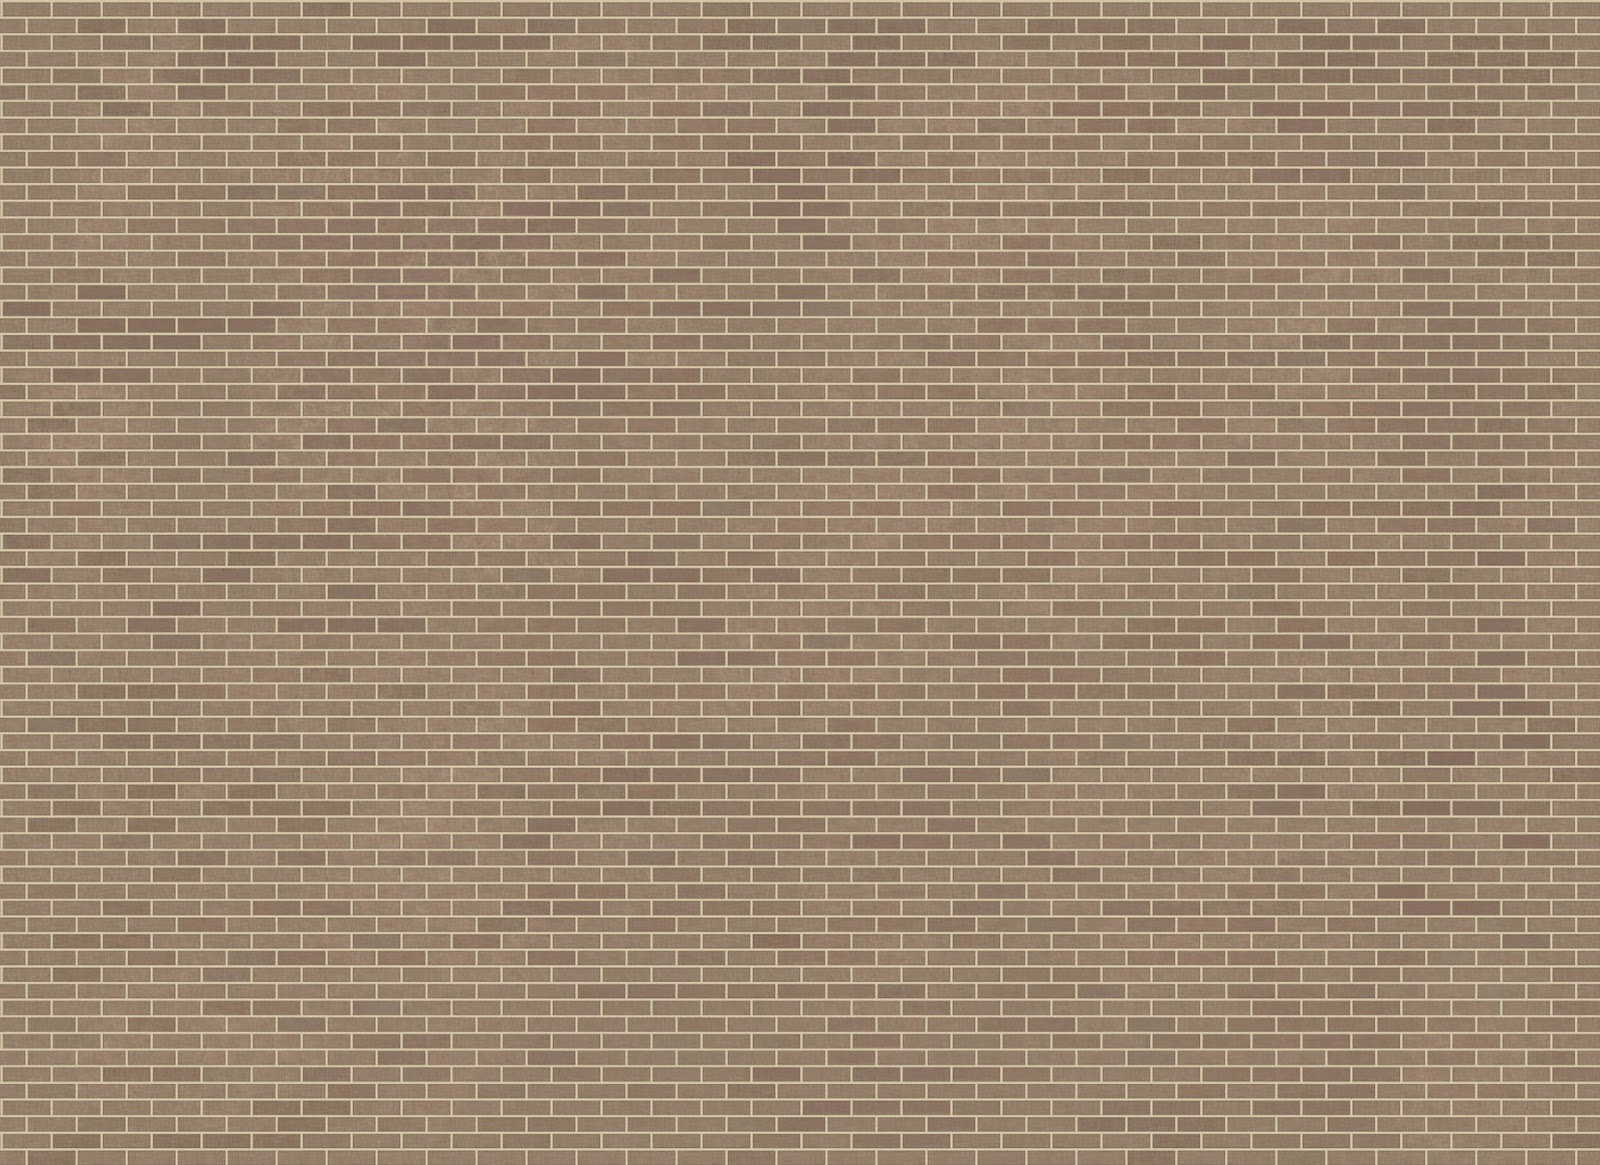 Swtexture Free Architectural Textures Brick Textures